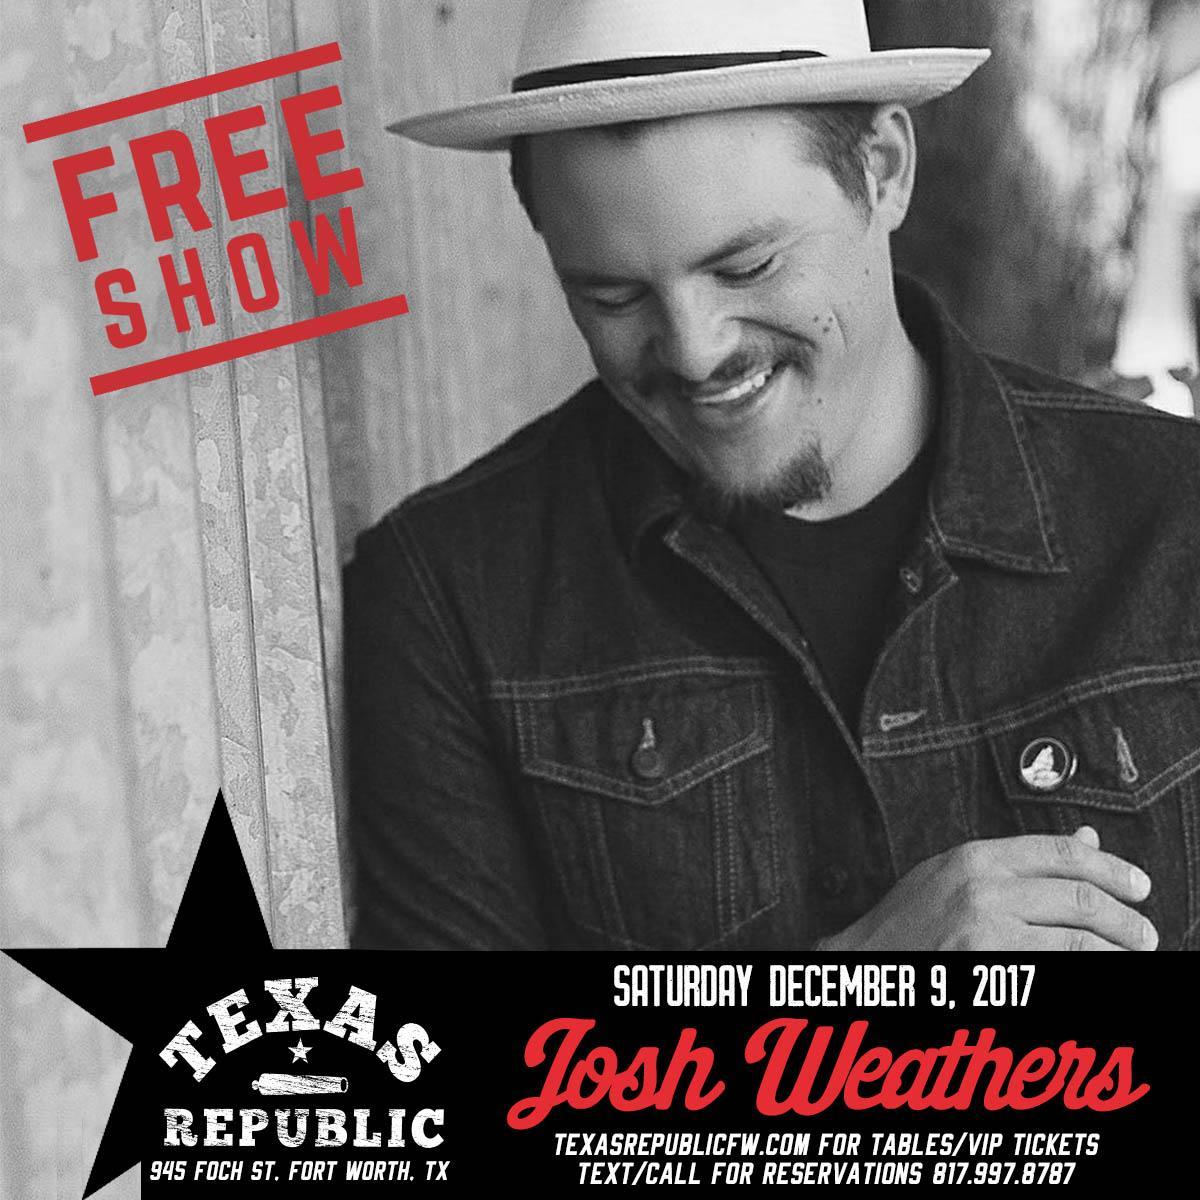 Joshua Weathers Concert | Fort Worth, TX | Texas Republic Bar | December 9, 2017